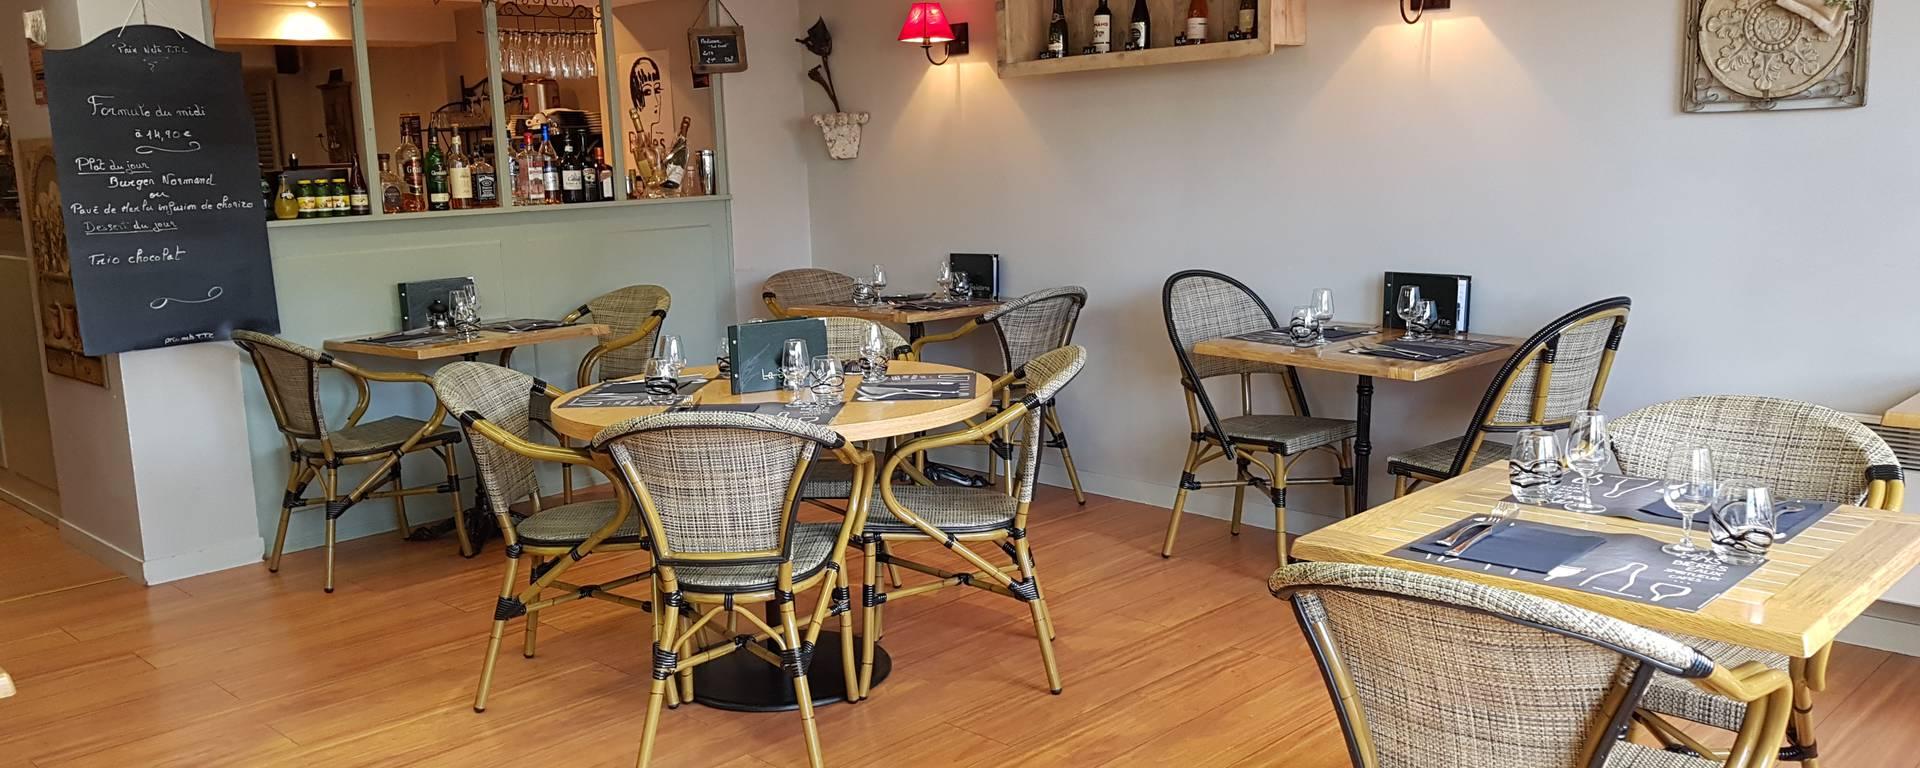 Salle du restaurant-la salicorne